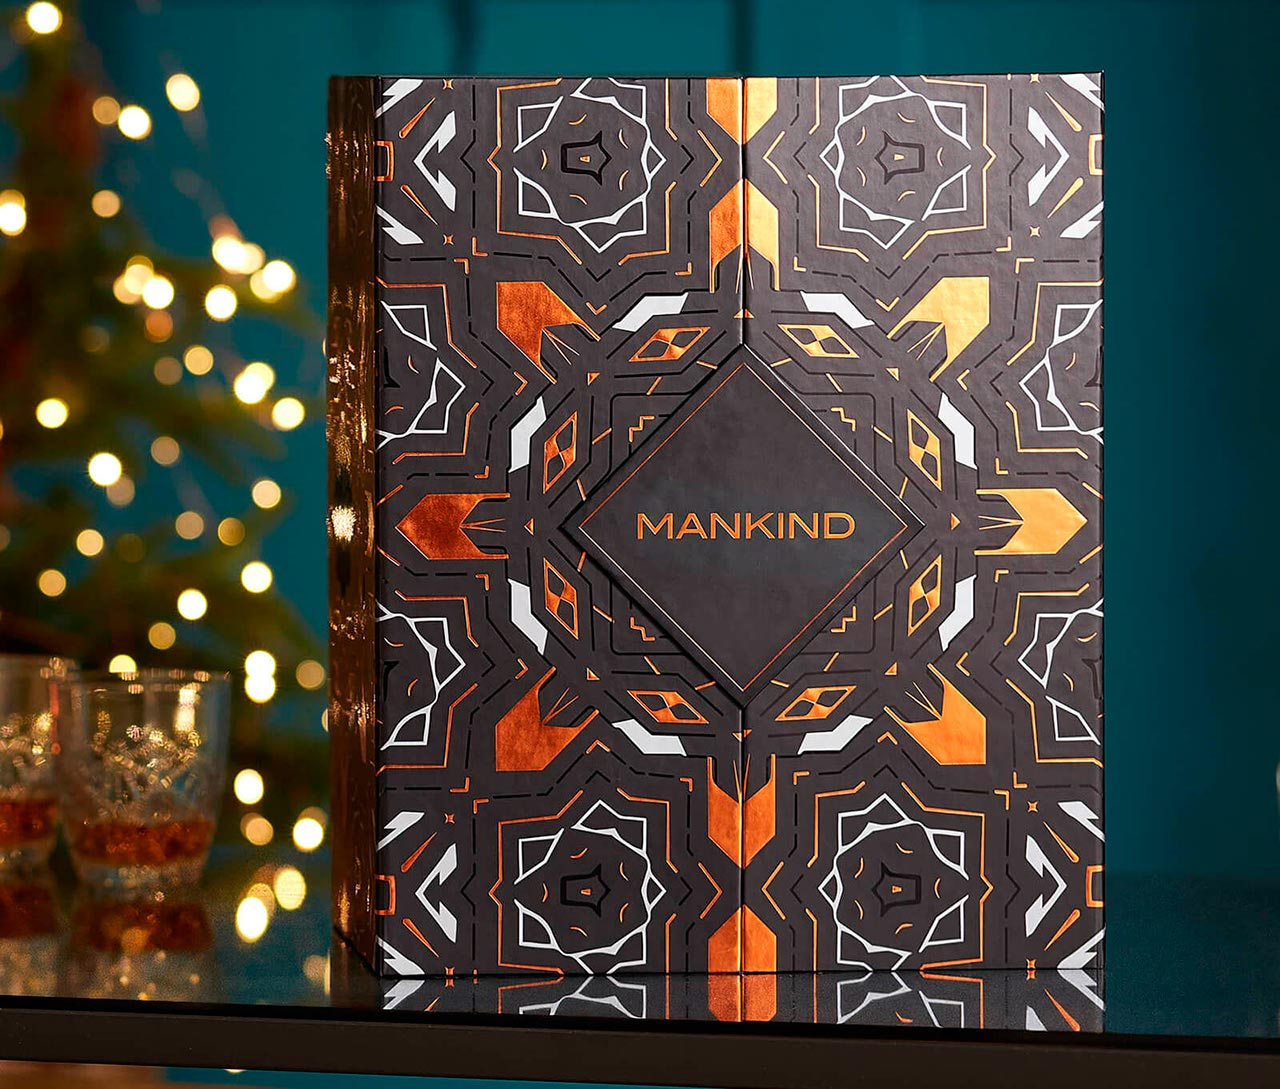 адвент-календарь Mankind 12 Days 2020 Advent Calendar